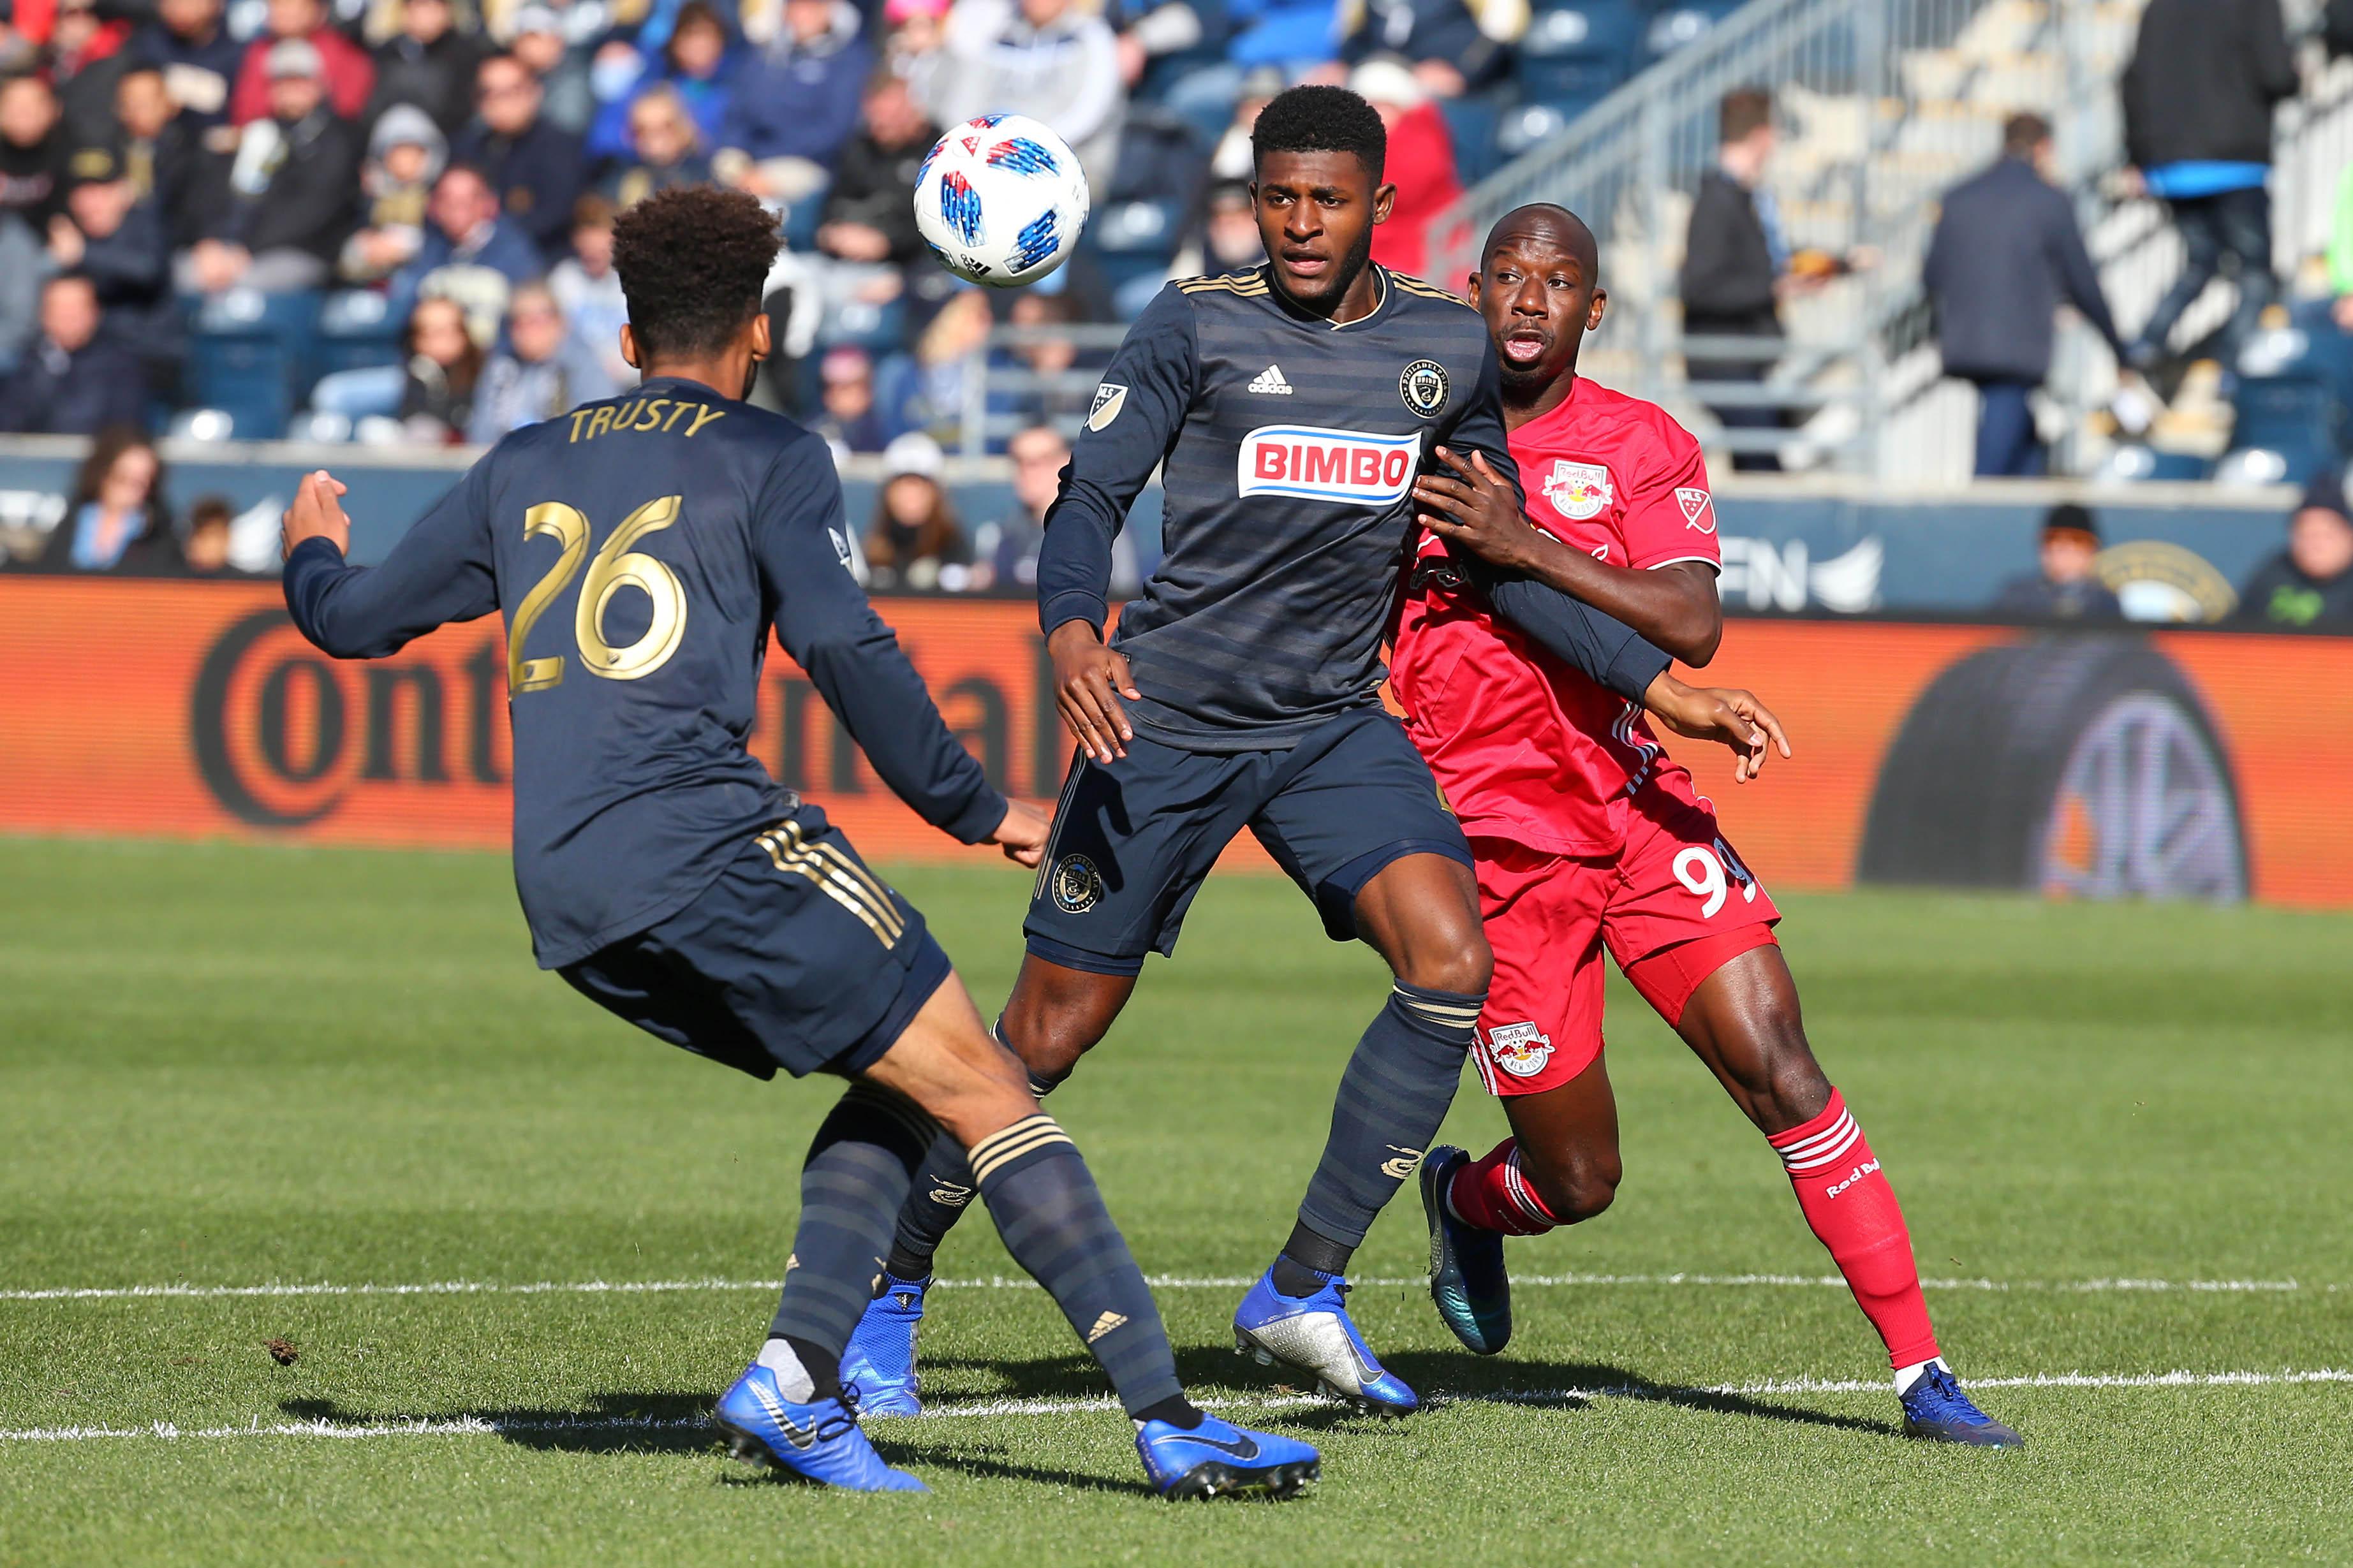 Philadelphia Union trio called up for U20 World Cup